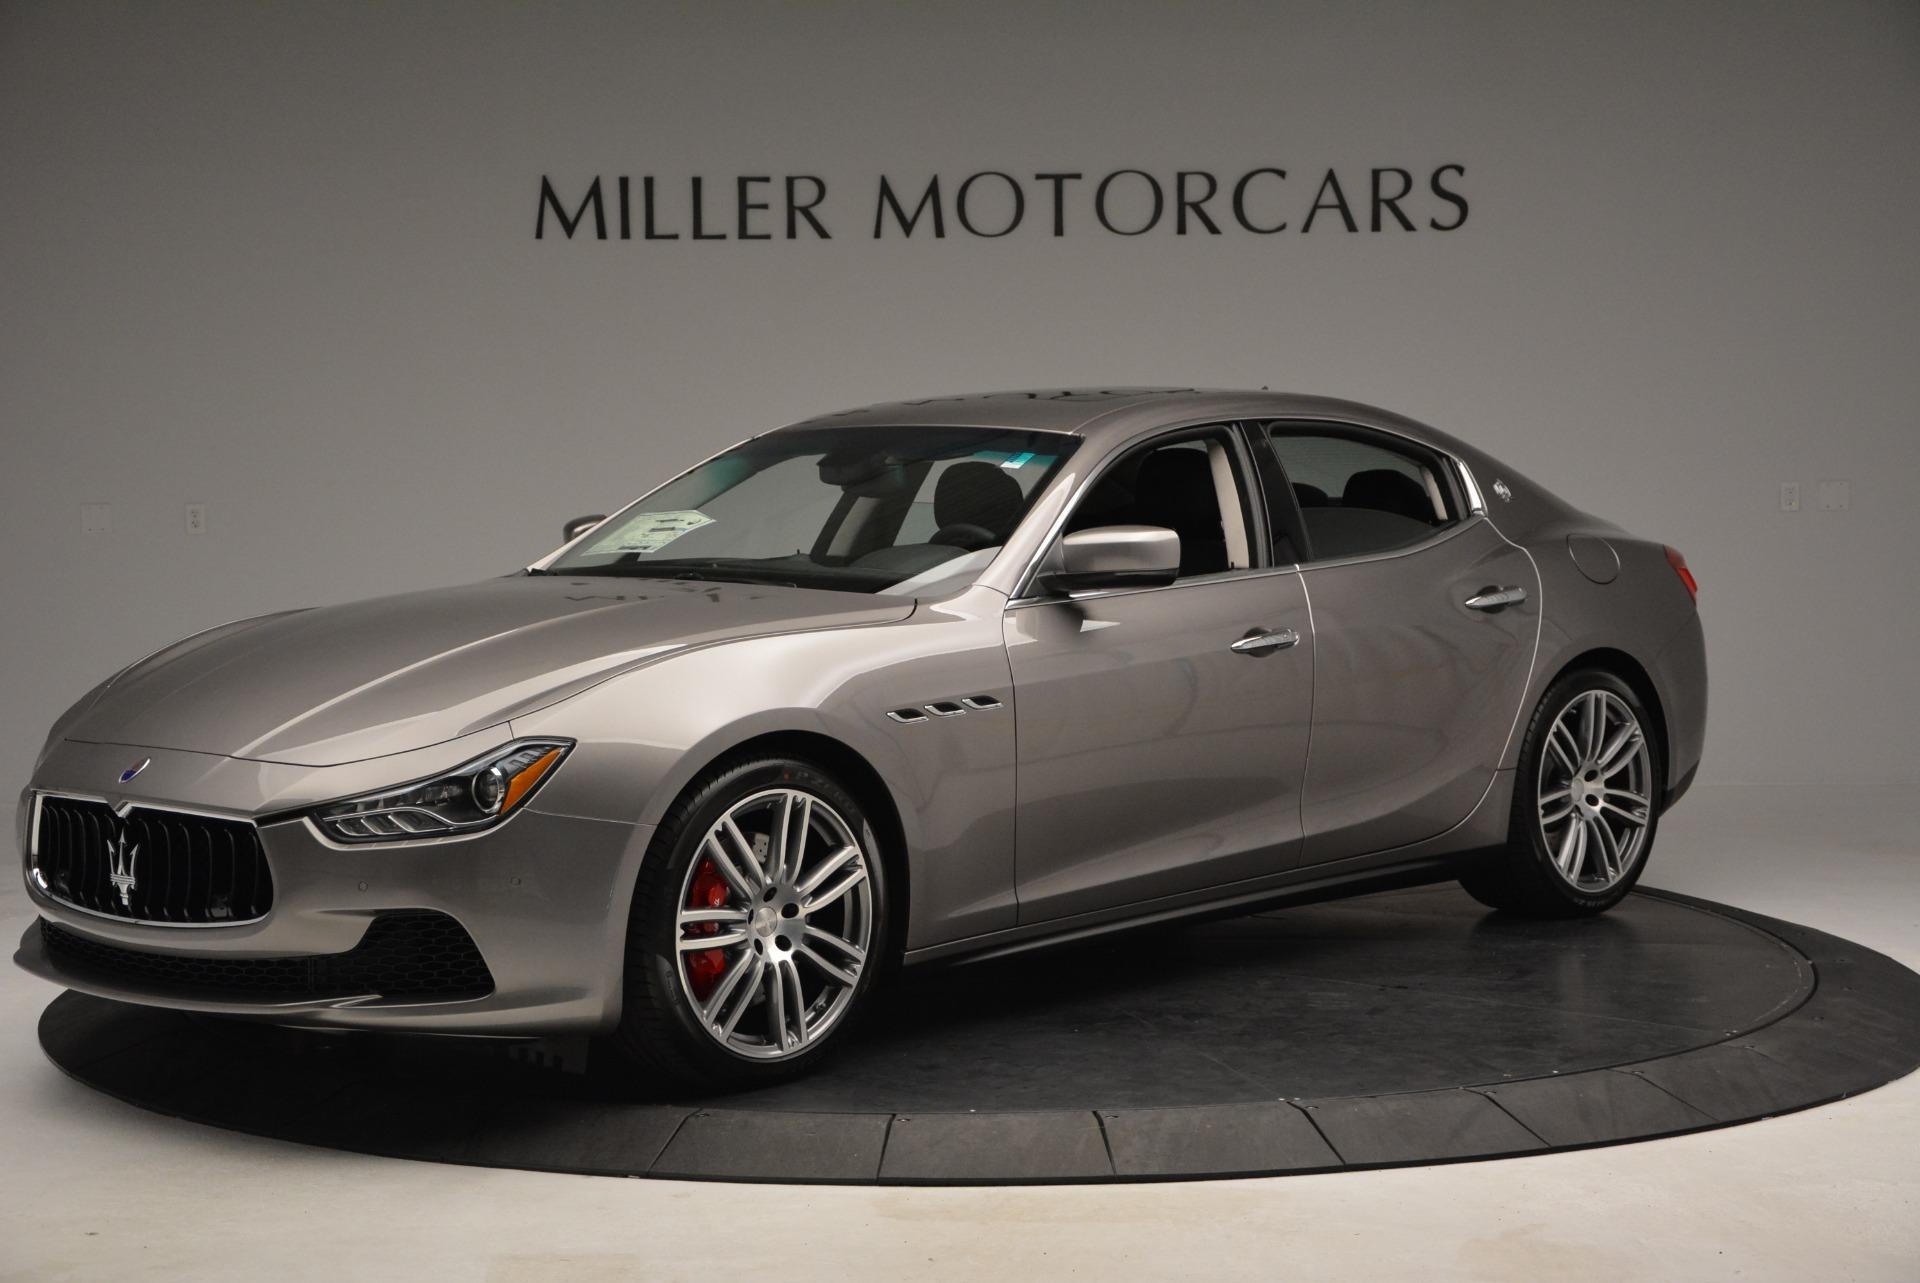 Used 2014 Maserati Ghibli S Q4 For Sale In Westport, CT 2562_p2